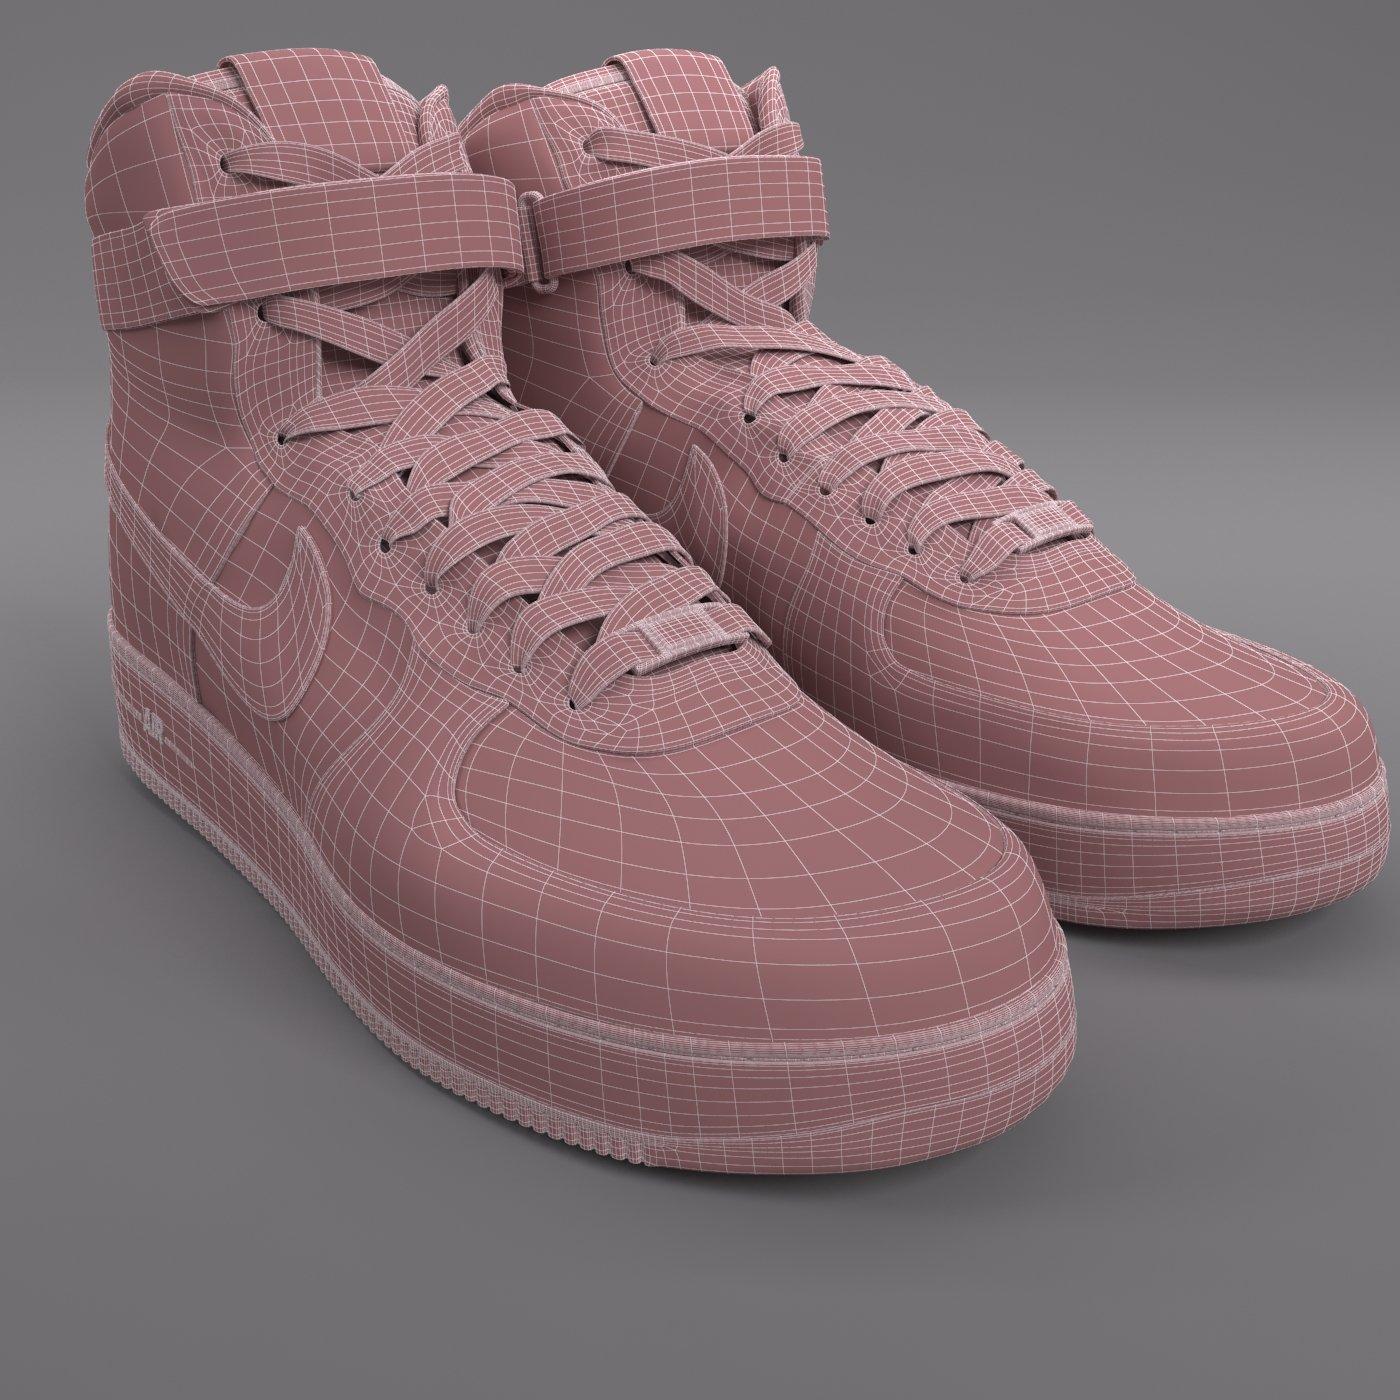 Air Force 1 Nike PBR 3D Model in Clothing 3DExport